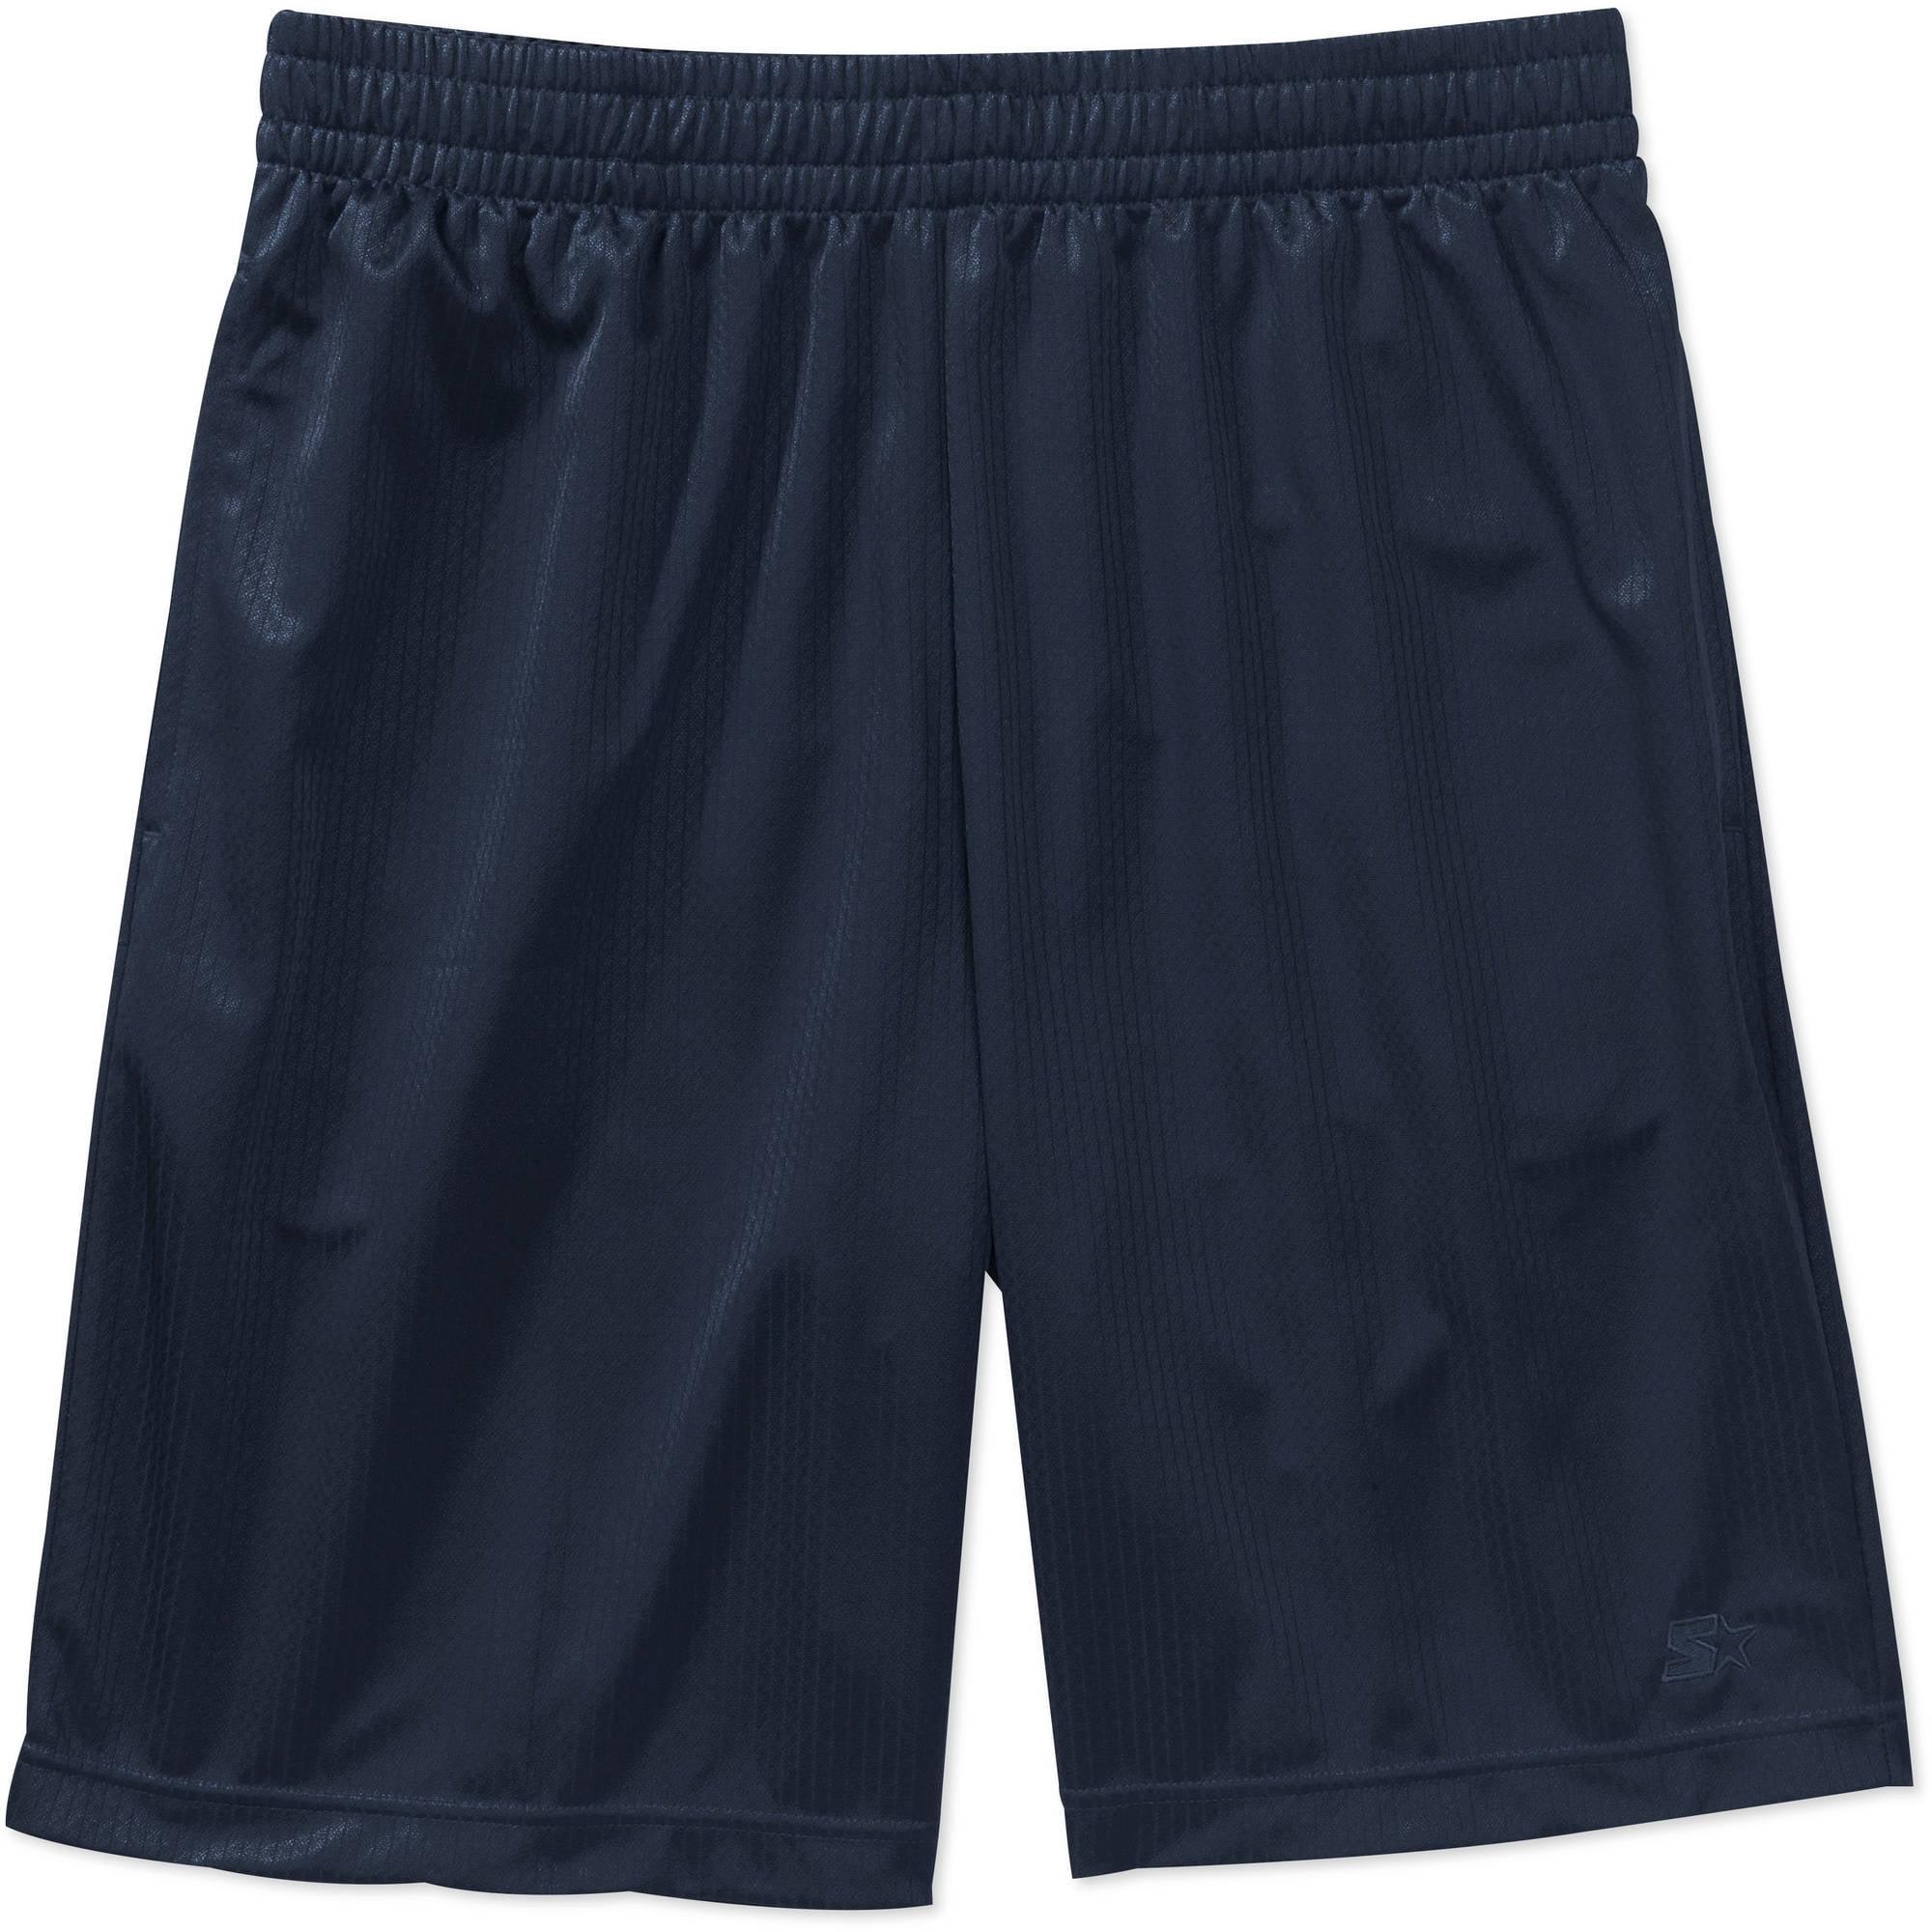 Starter Men's Dazzle Short